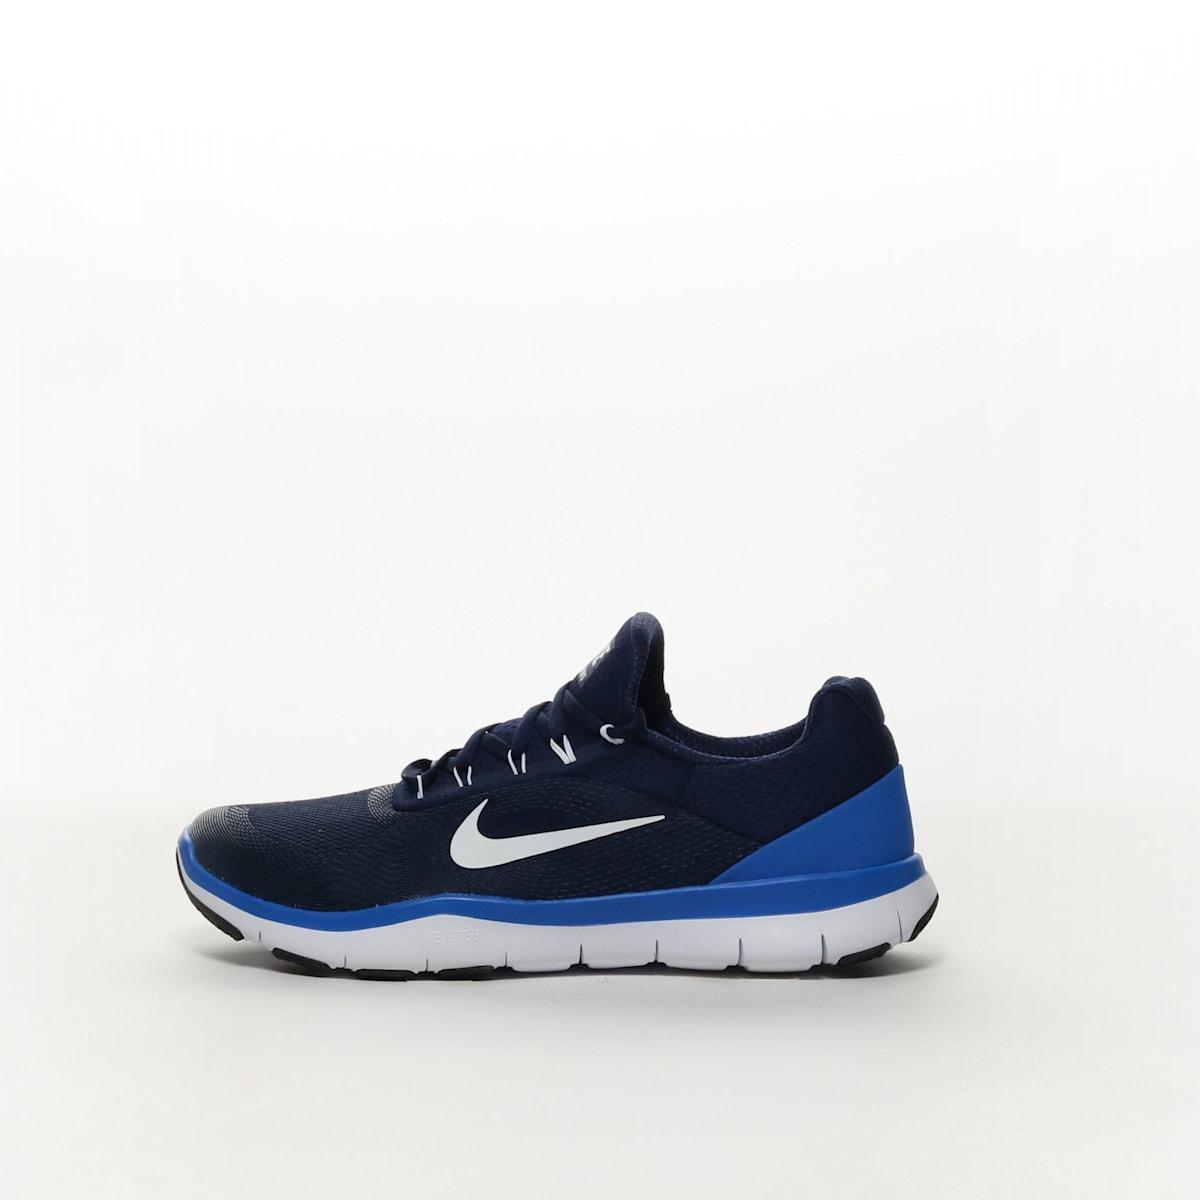 2668a895c55f Men s Nike Free Trainer v7 Training Shoe - BINARY BLUE WHITE-HYPER ...